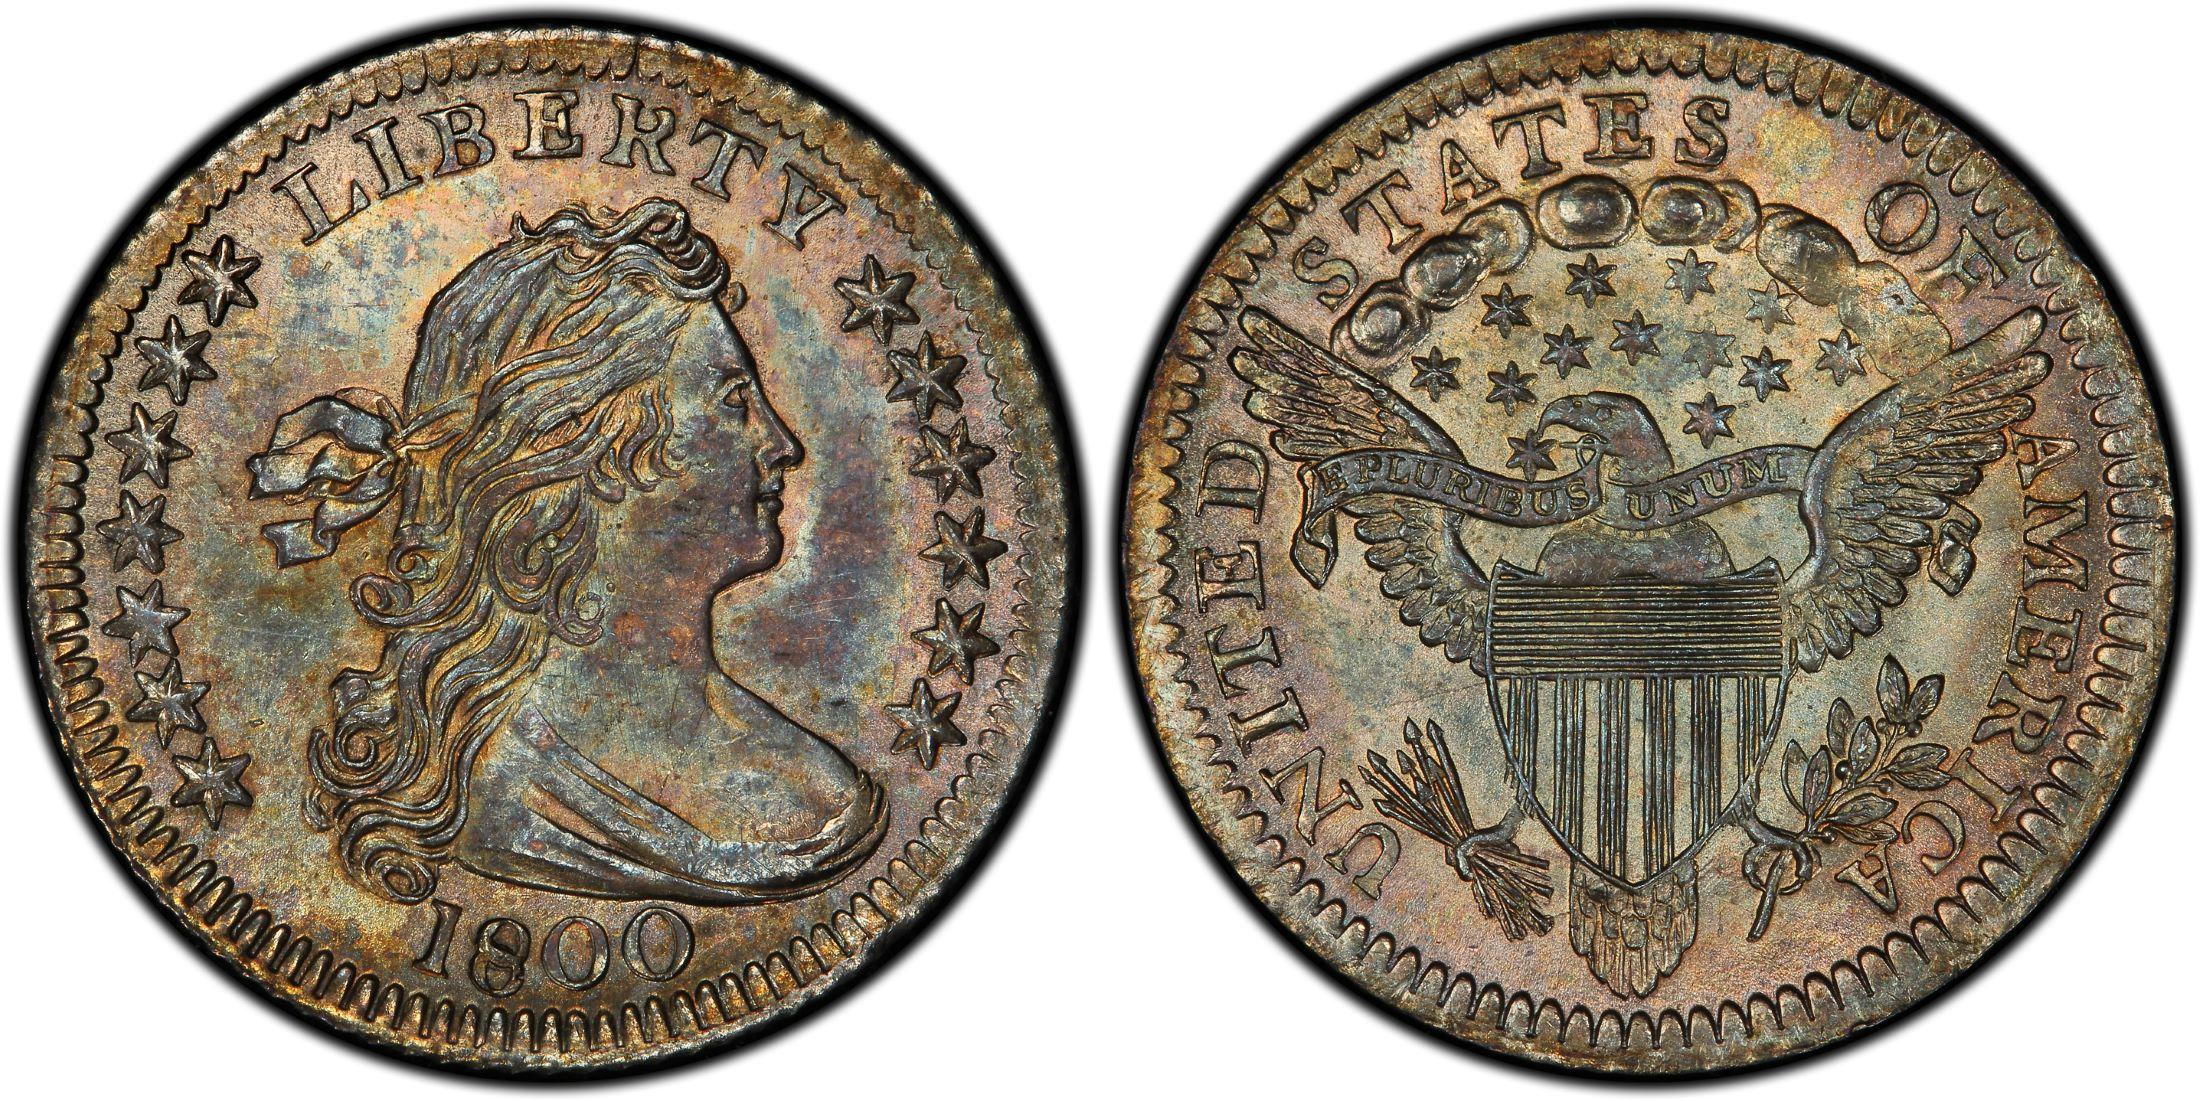 US Coin - 1800 - Draped Bust Half Dime - Philadelphia